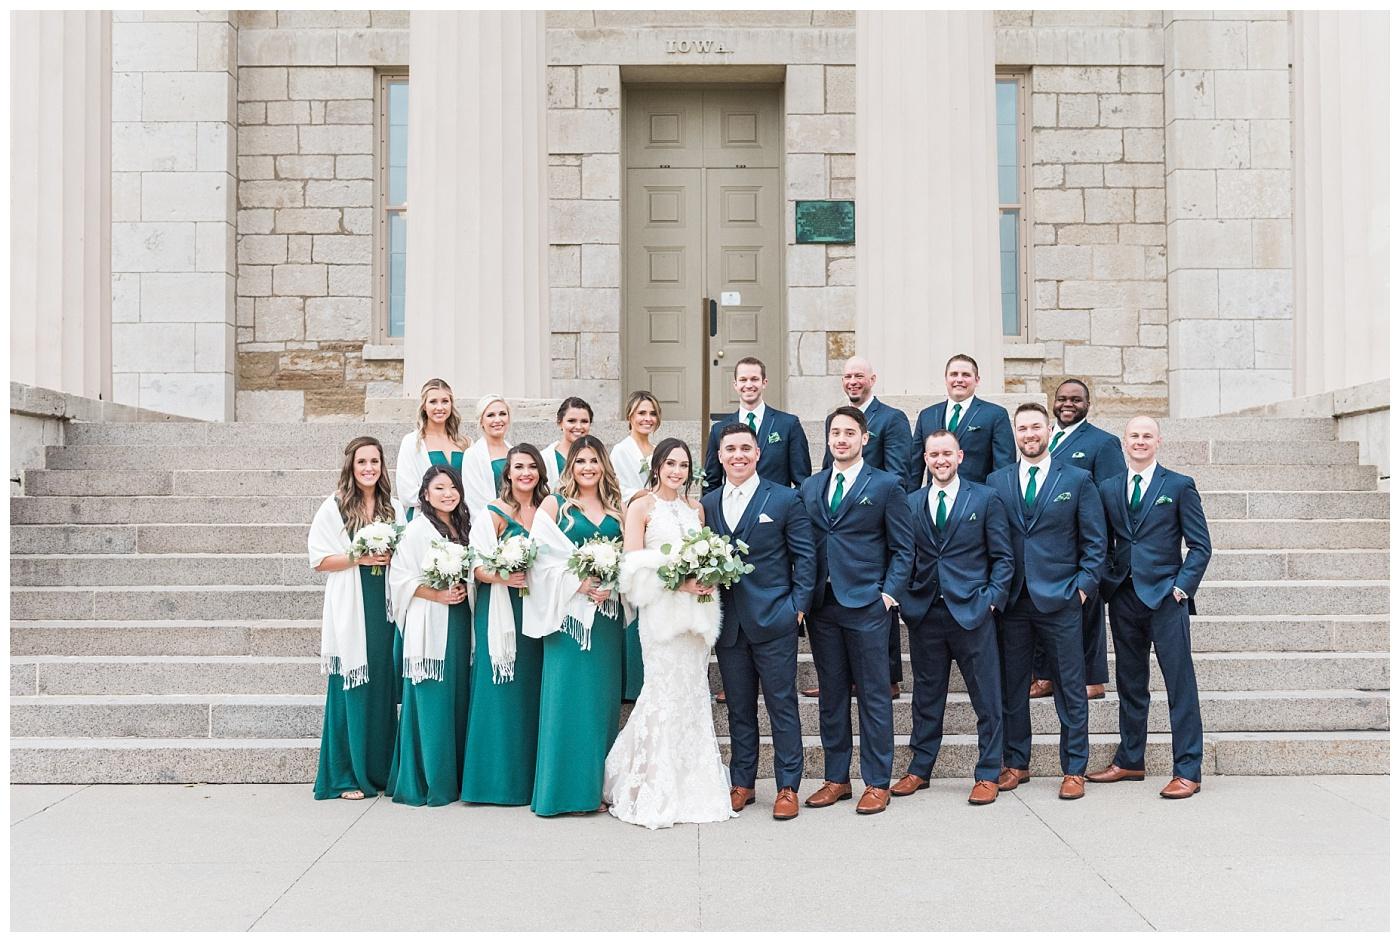 Stephanie Marie Photography Unitarian Universalist Society Church Ceremony Hotel Kirkwood Reception Cedar Rapids Iowa City Wedding Photographer Sean Madison Moore_0046.jpg